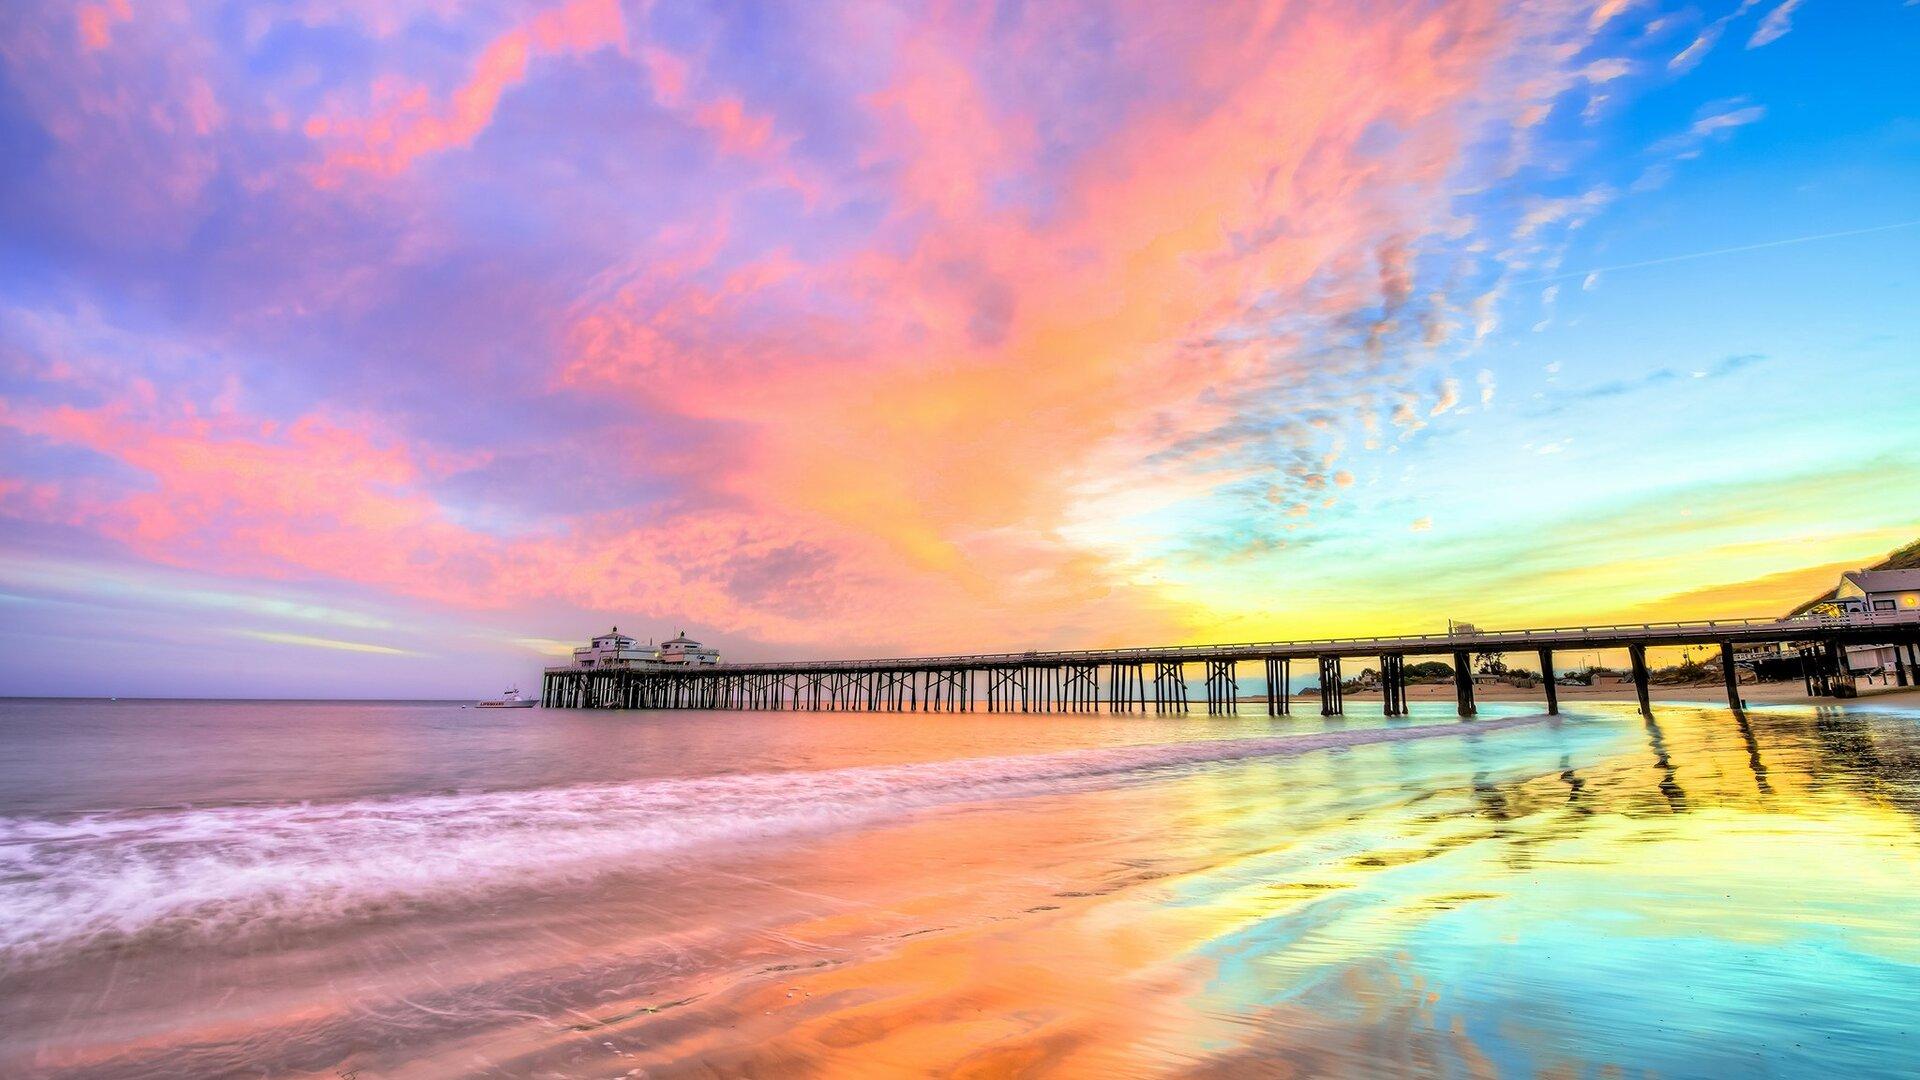 1920x1080 pier beach california laptop full hd 1080p hd 4k - Beach hd wallpapers 1080p ...